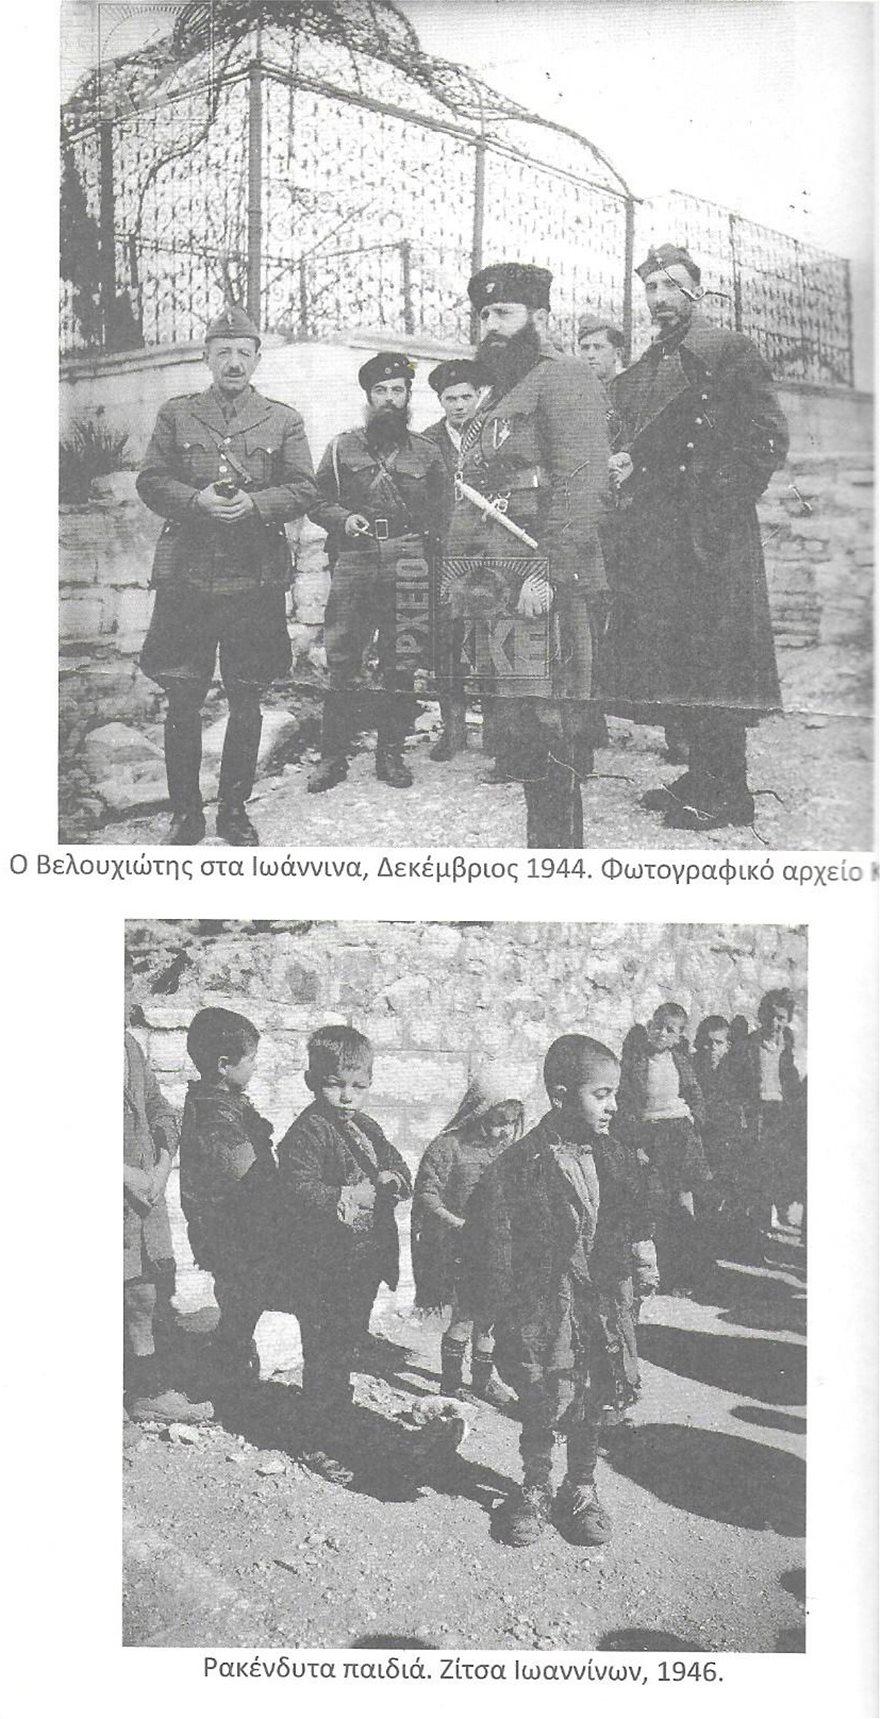 kke-albania-8